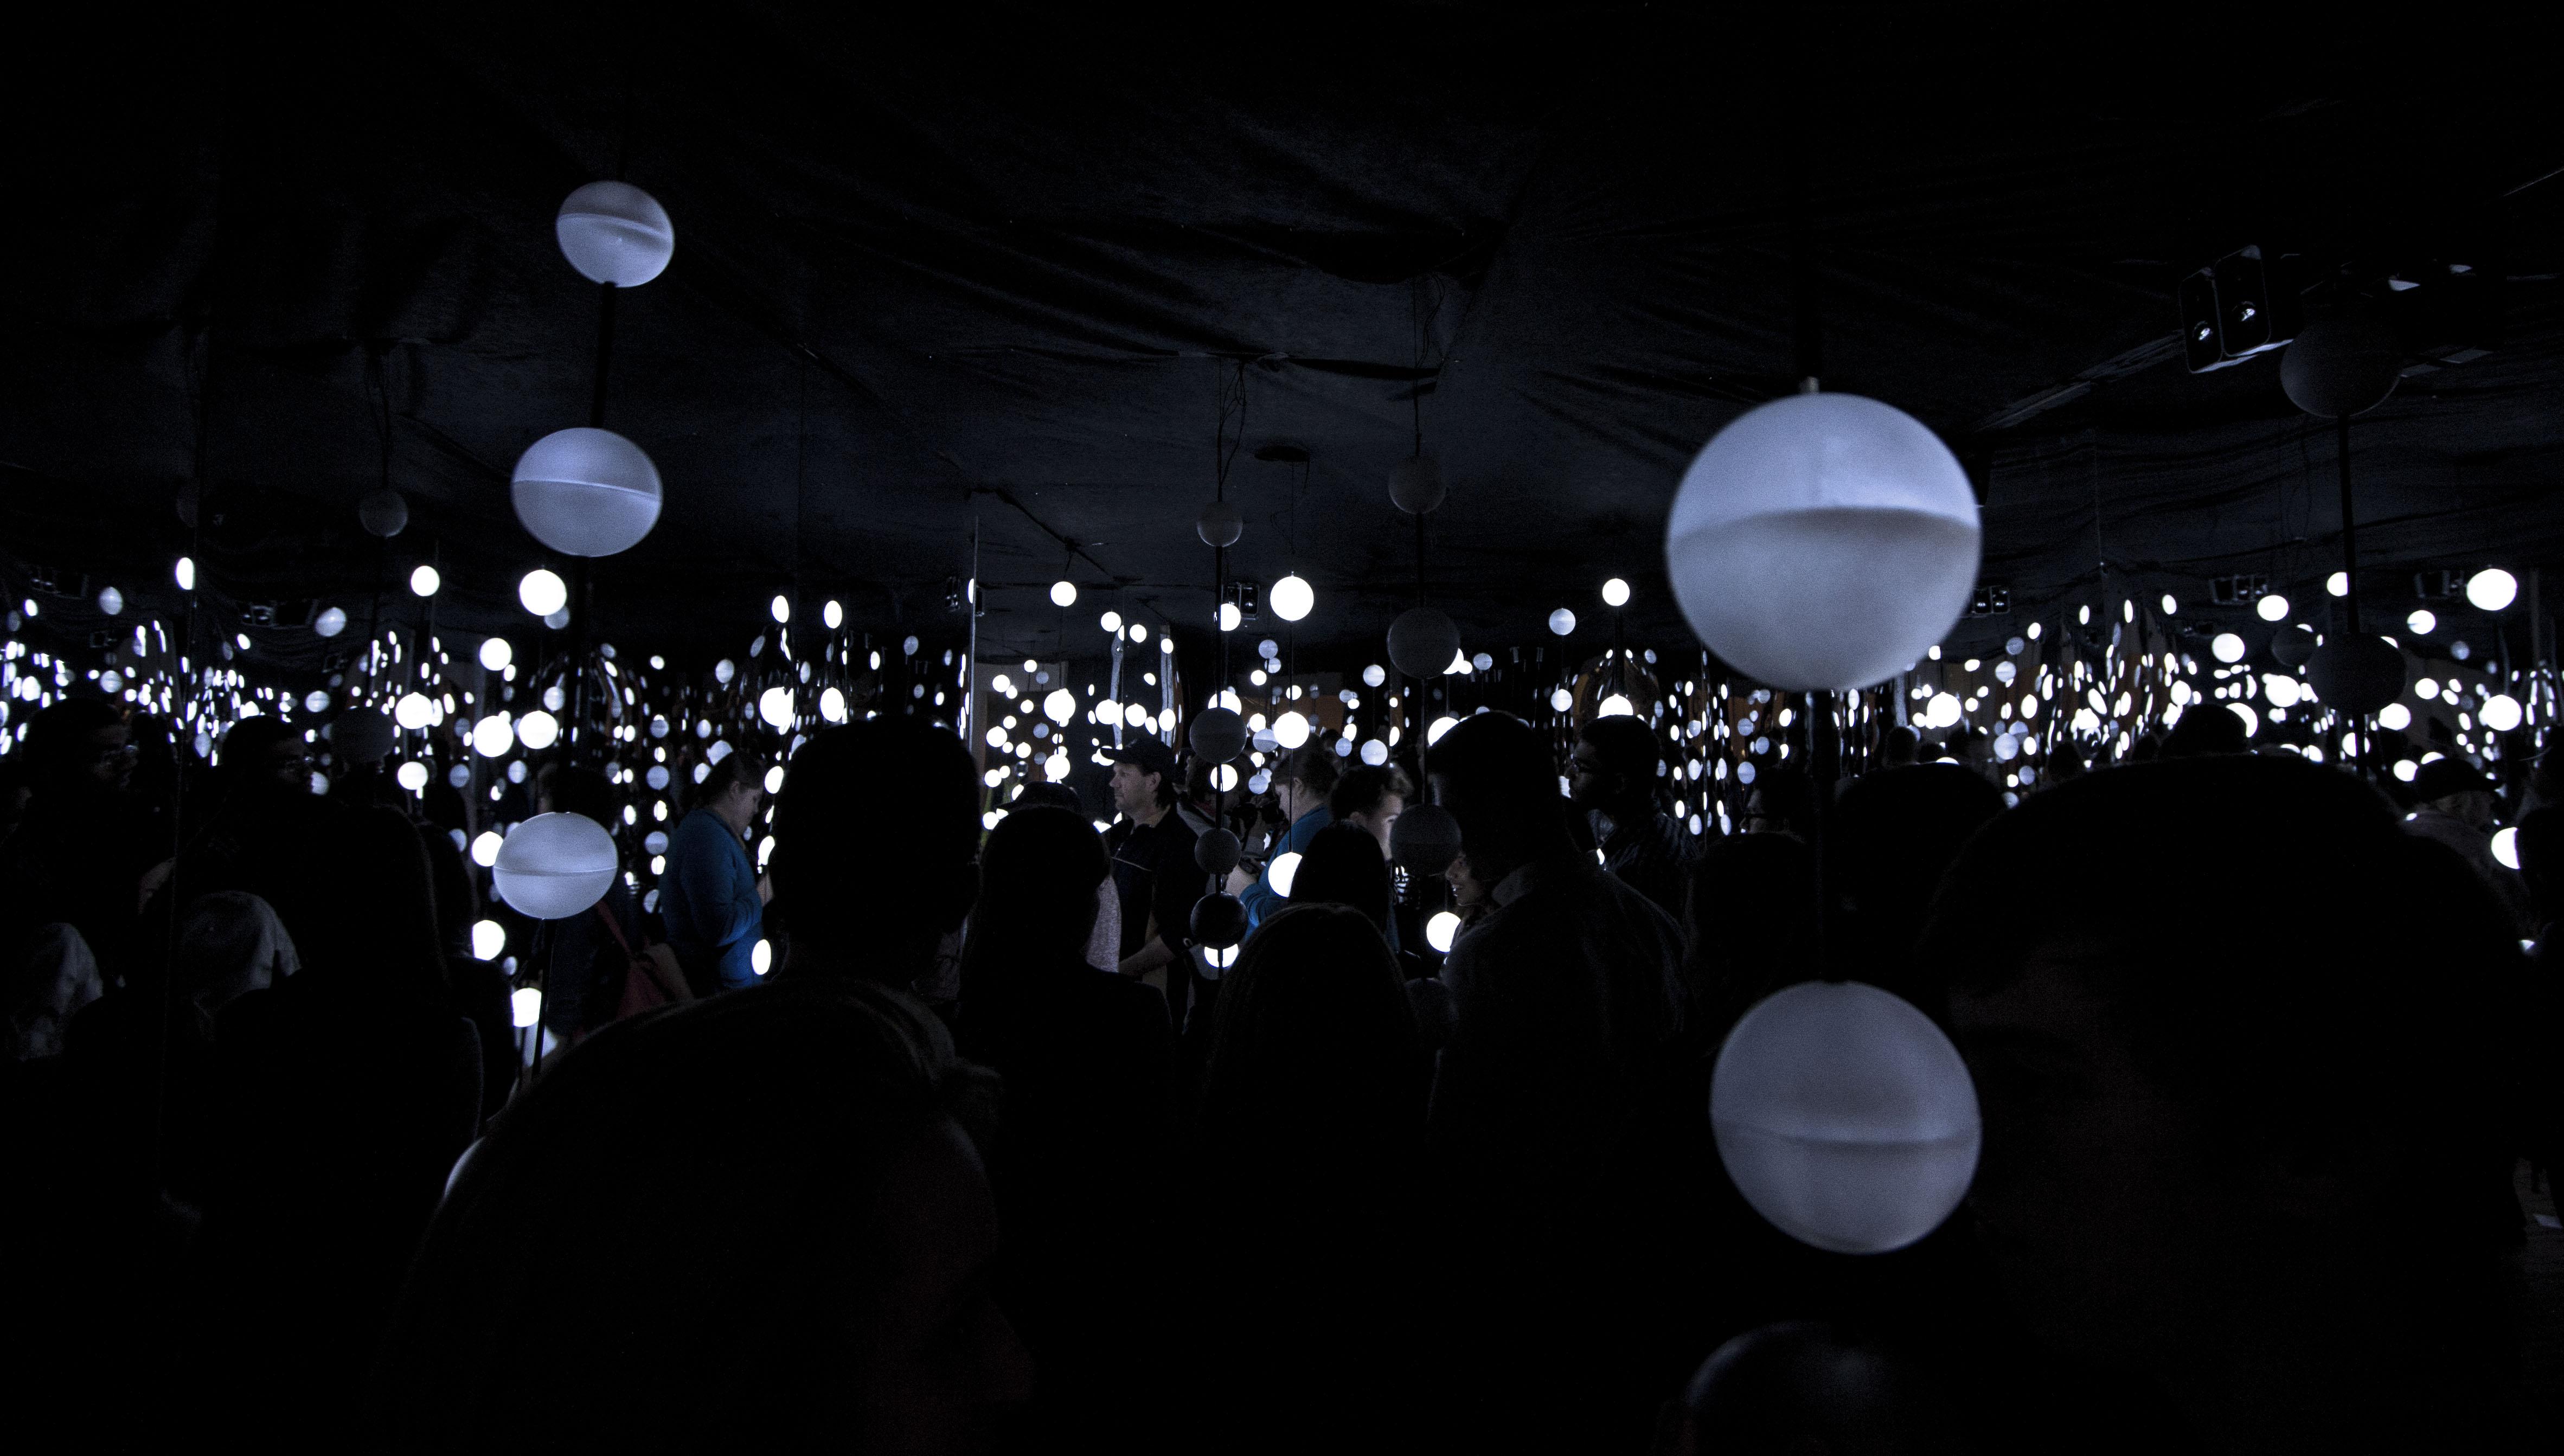 File:Glow in the Dark (10674495155).jpg - Wikimedia Commons